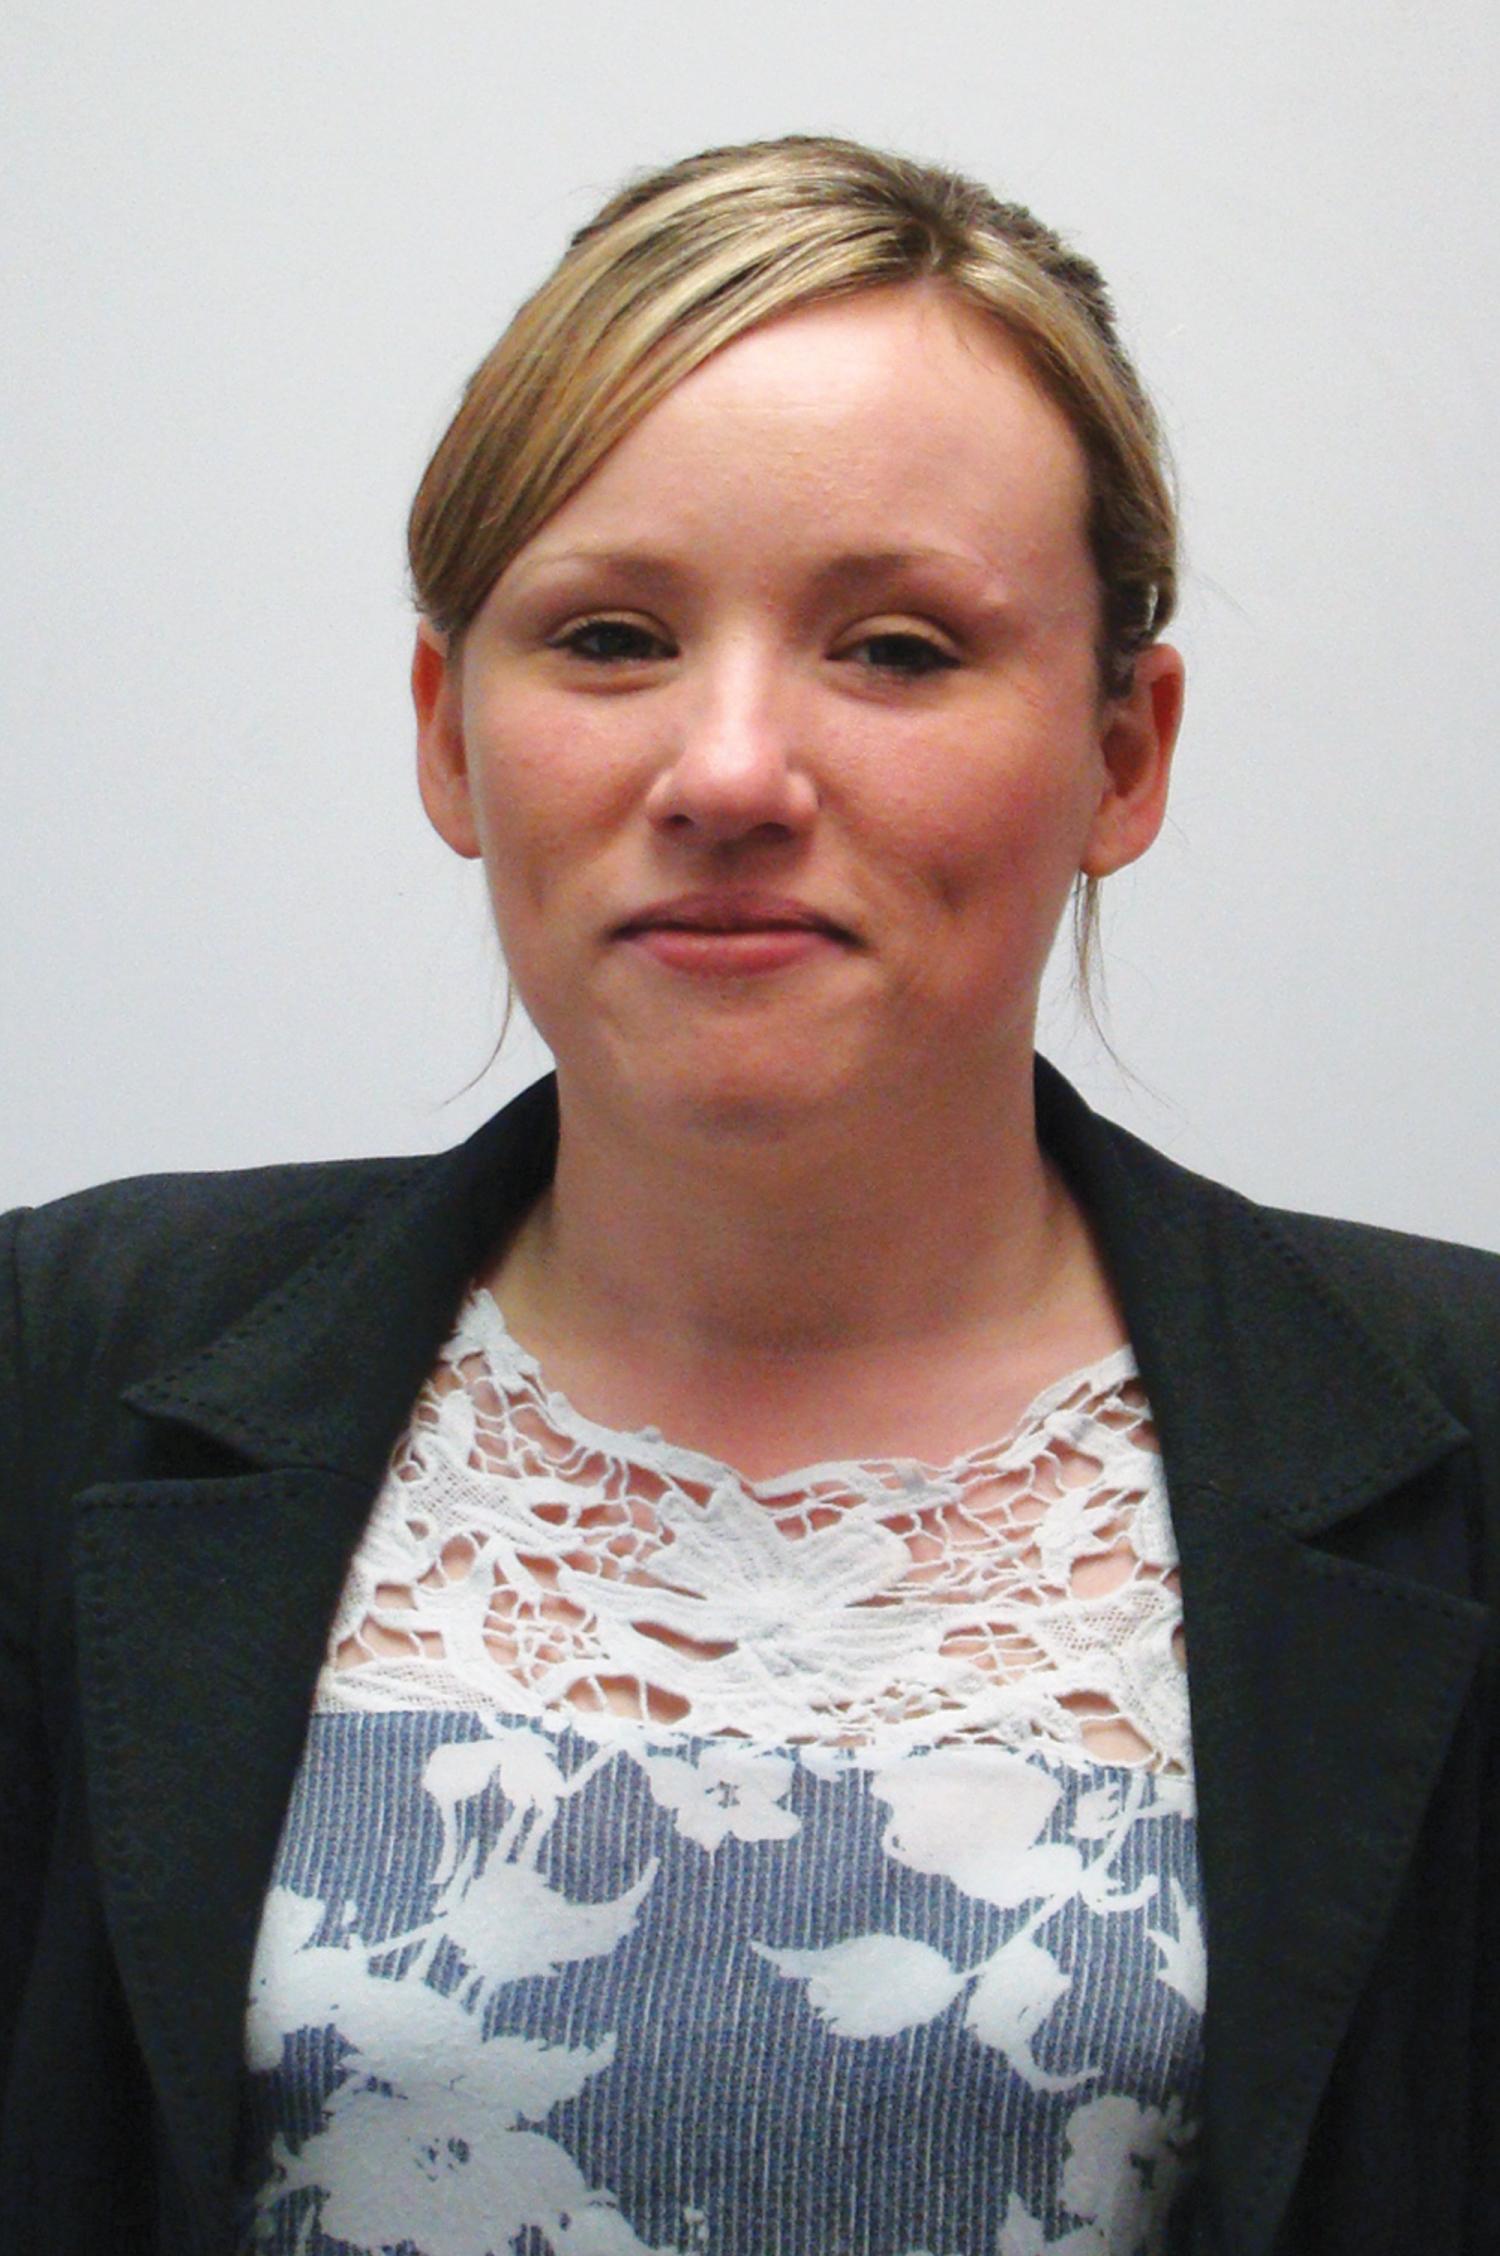 Emma McLeister